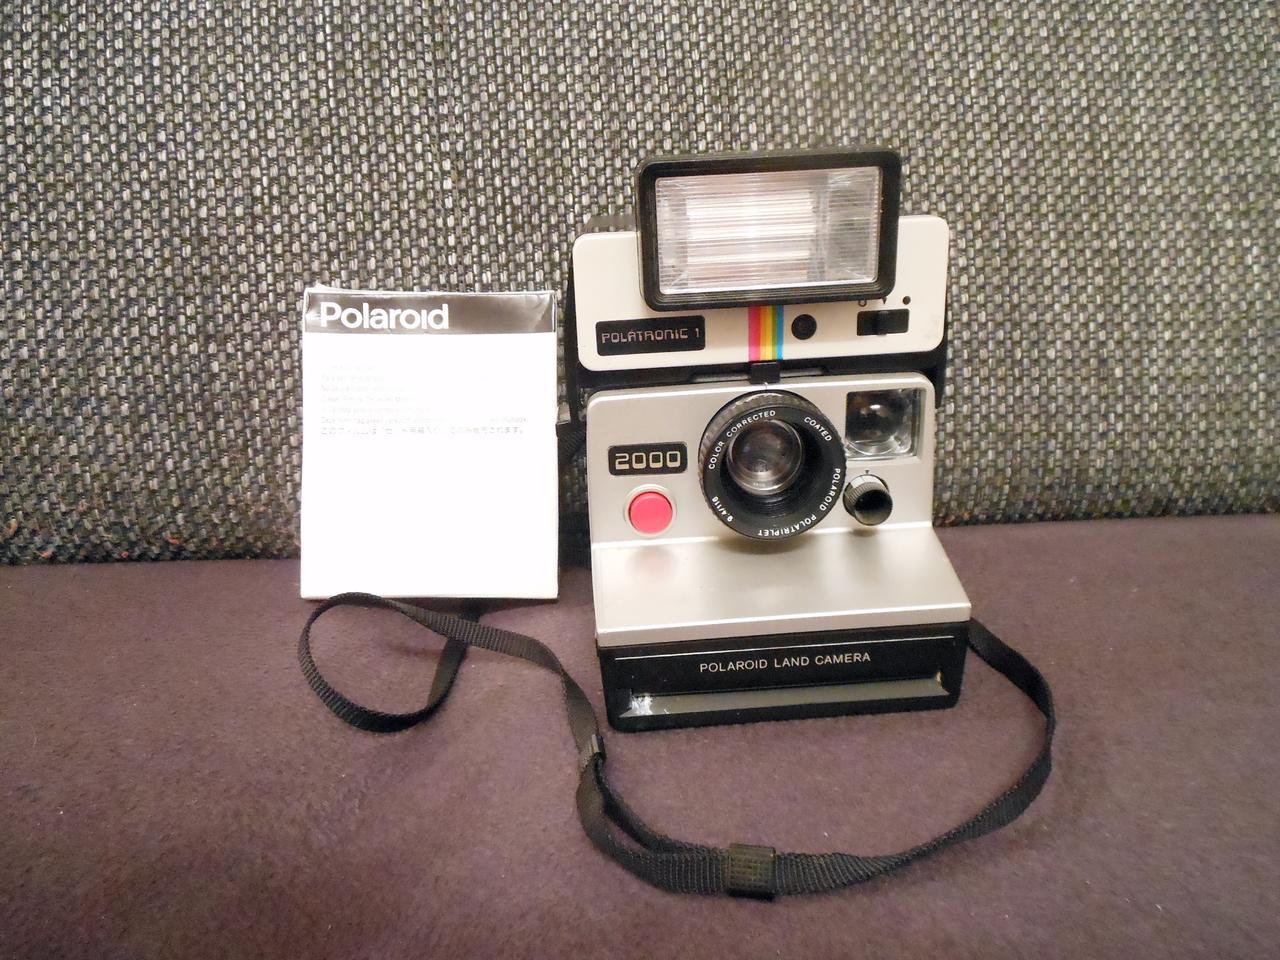 polaroid land camera 2000 sofortbildkamera polatronic 1 original film sx 70 ebay. Black Bedroom Furniture Sets. Home Design Ideas